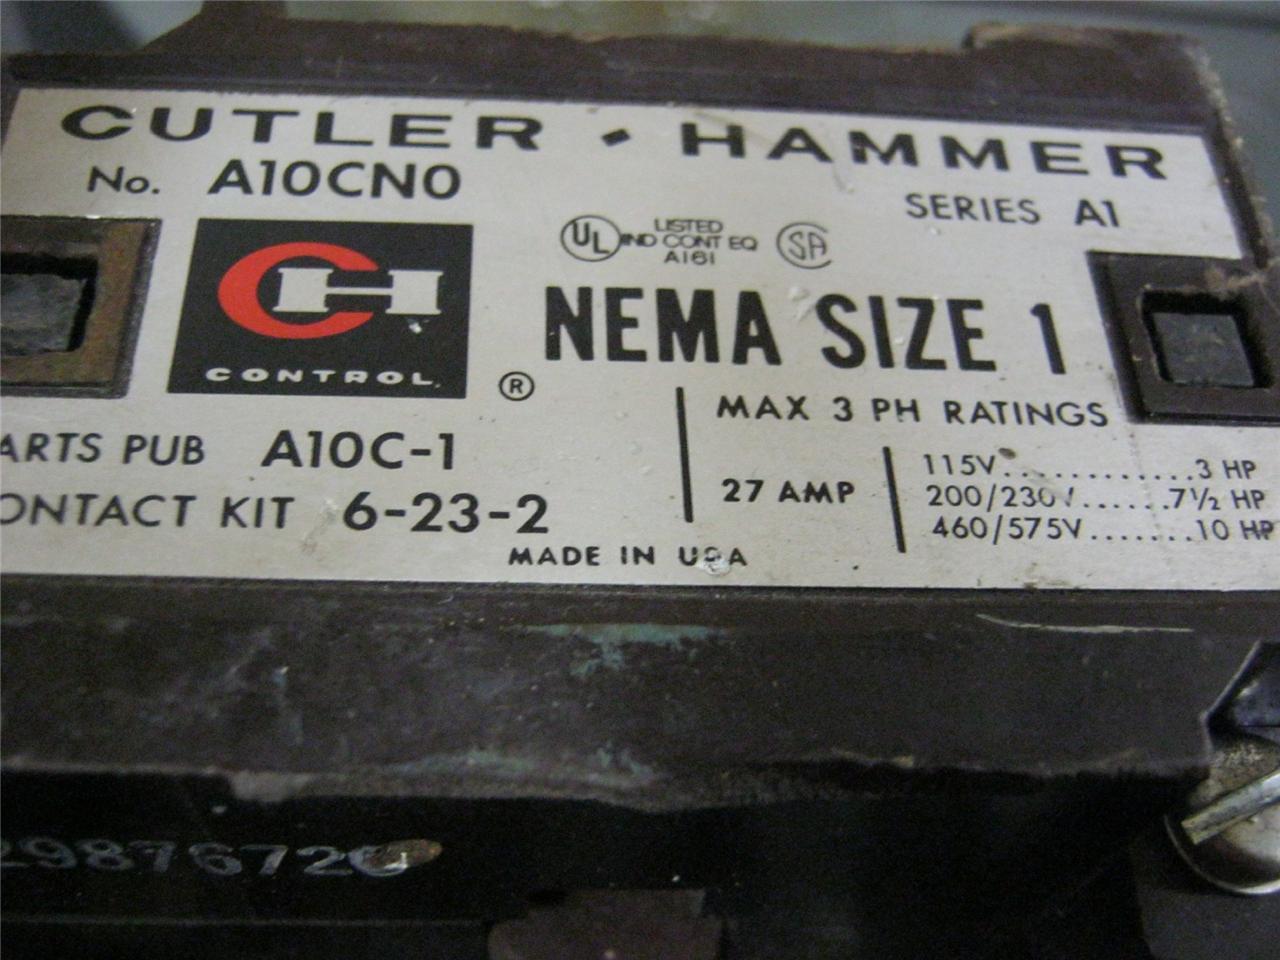 dis0193-cutler-hammer-nema-size-1-motor-starter-a10cno-enclosure-4 Cutler Hammer A Cno Wiring Diagram on cutler supply catalog, cutler hammer fuses, cutler hammer transmission, cutler hammer torque specifications, cutler hammer parts list, cutler hammer schematics, cutler hammer lights, cutler hammer electrical, cutler hammer starter, cutler hammer controls, cutler hammer drawings,